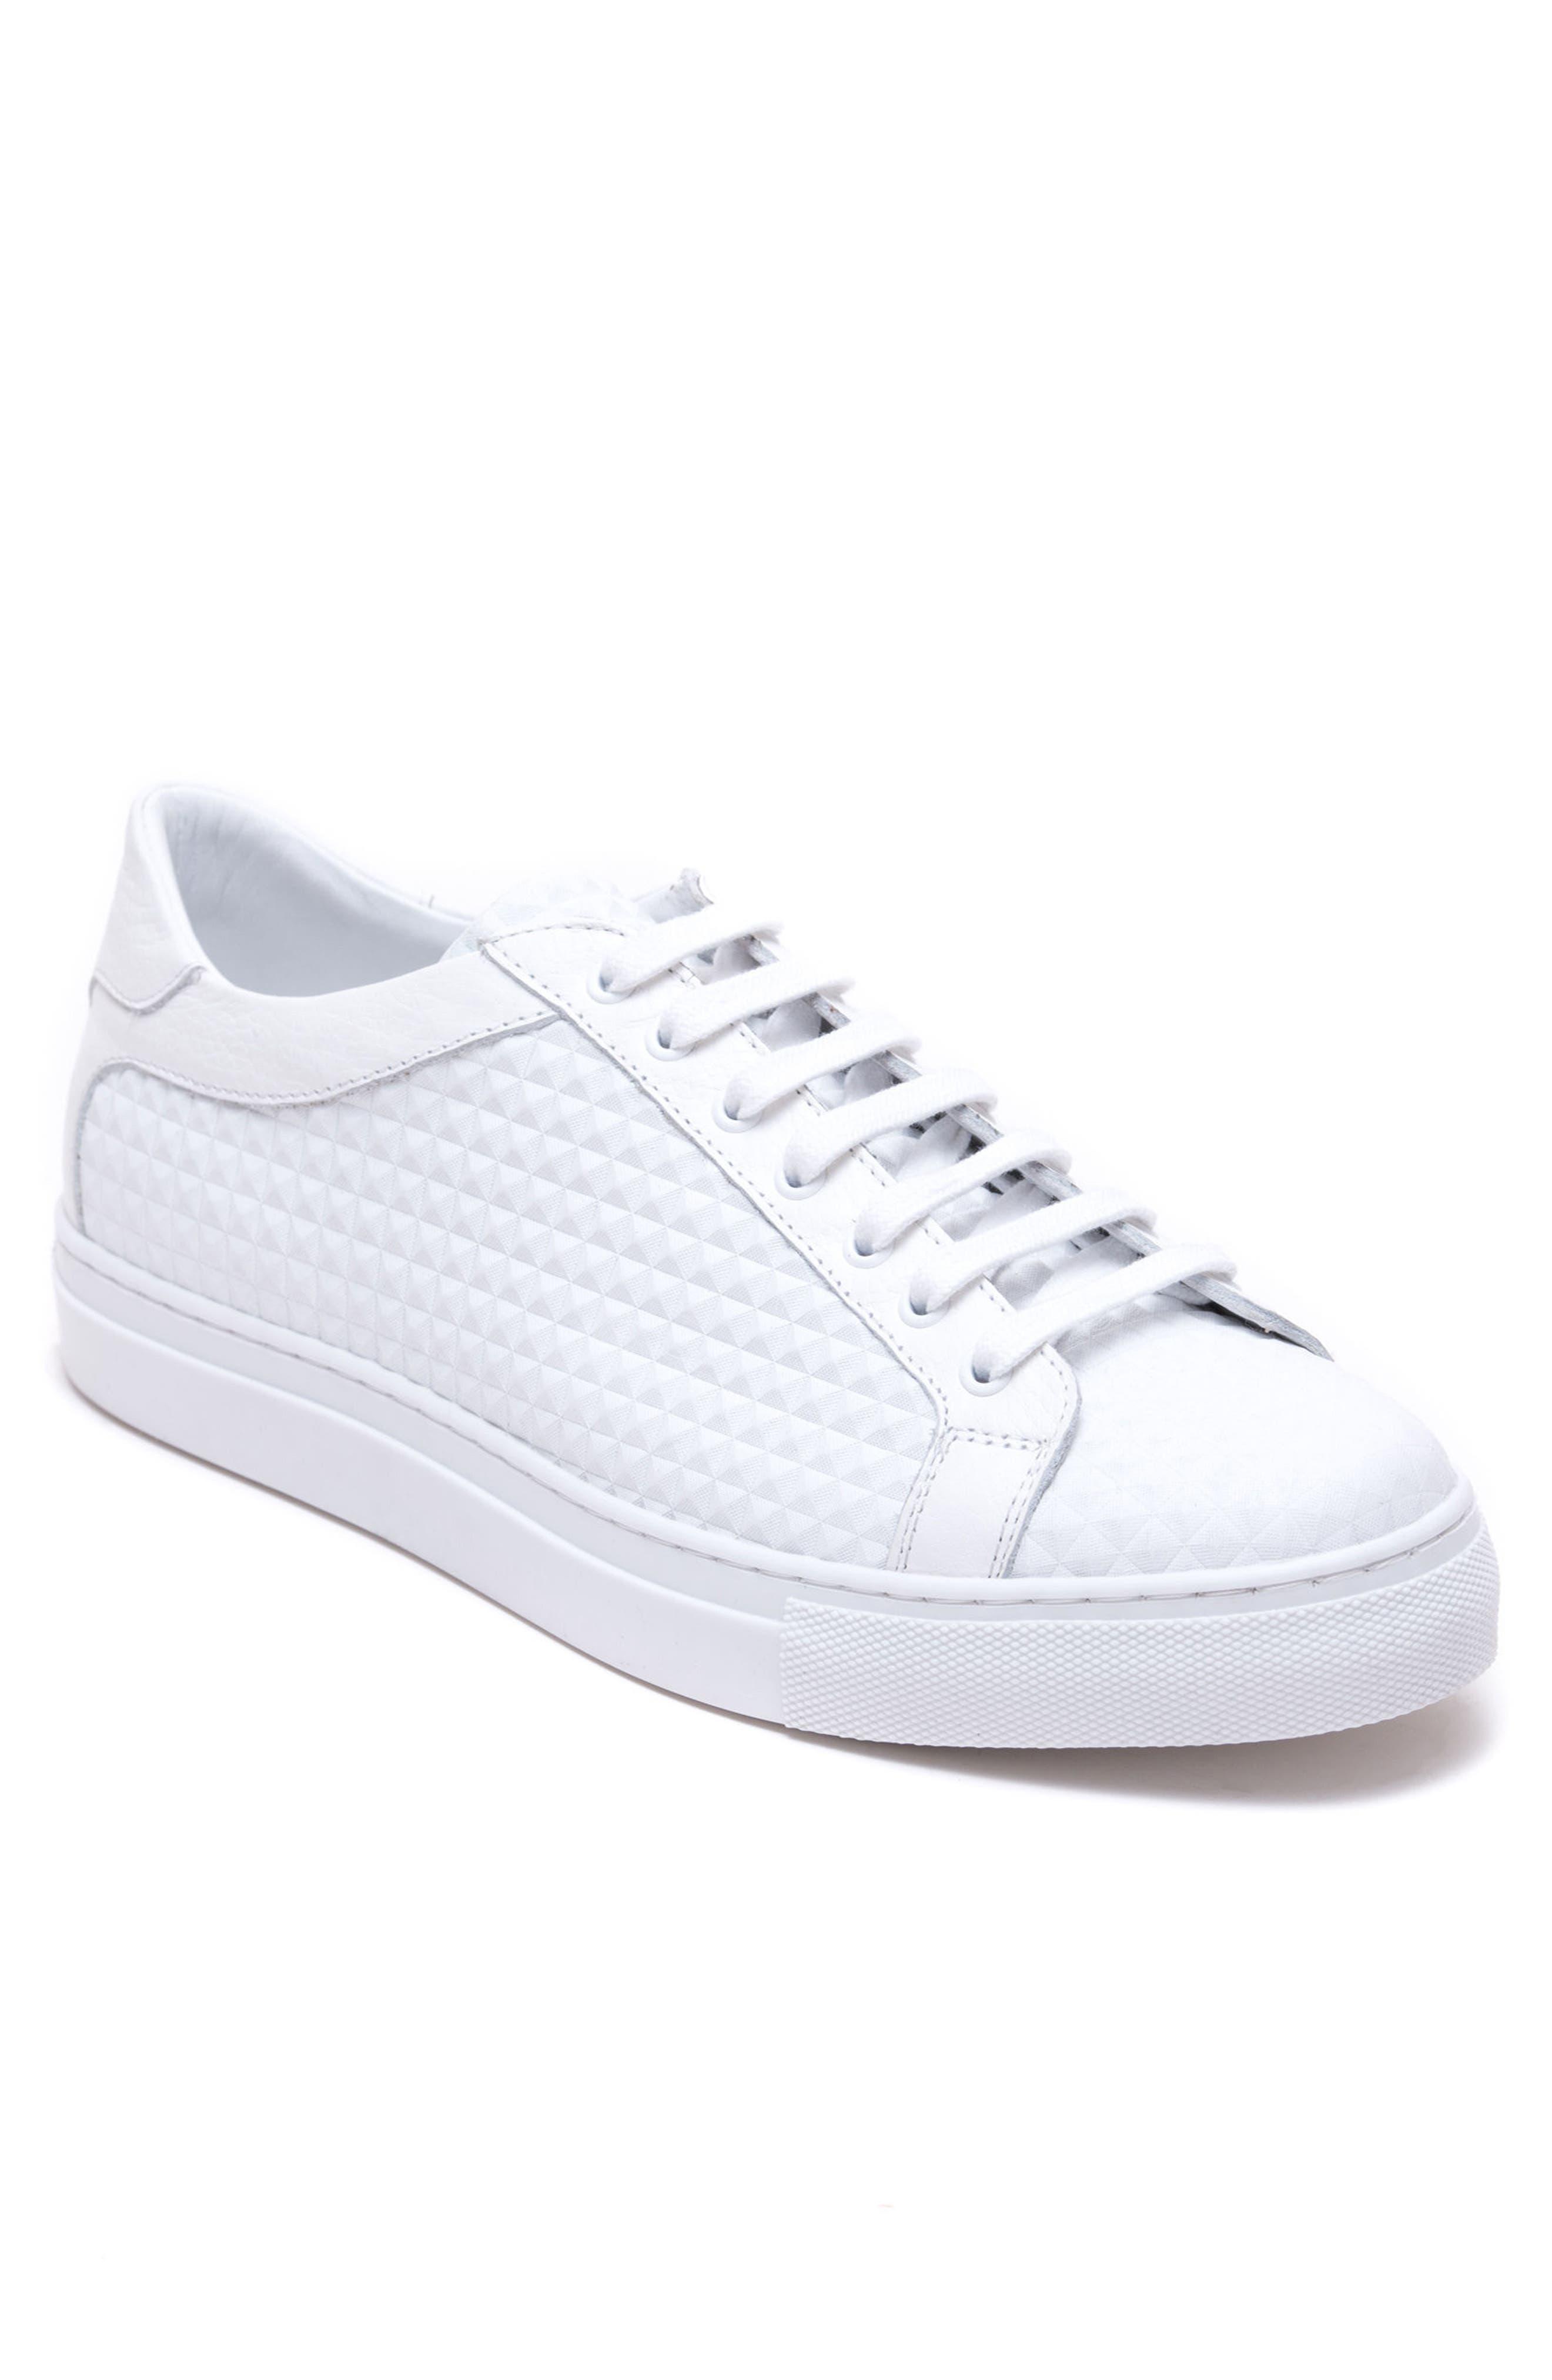 Scott Leather Sneaker,                             Main thumbnail 1, color,                             White